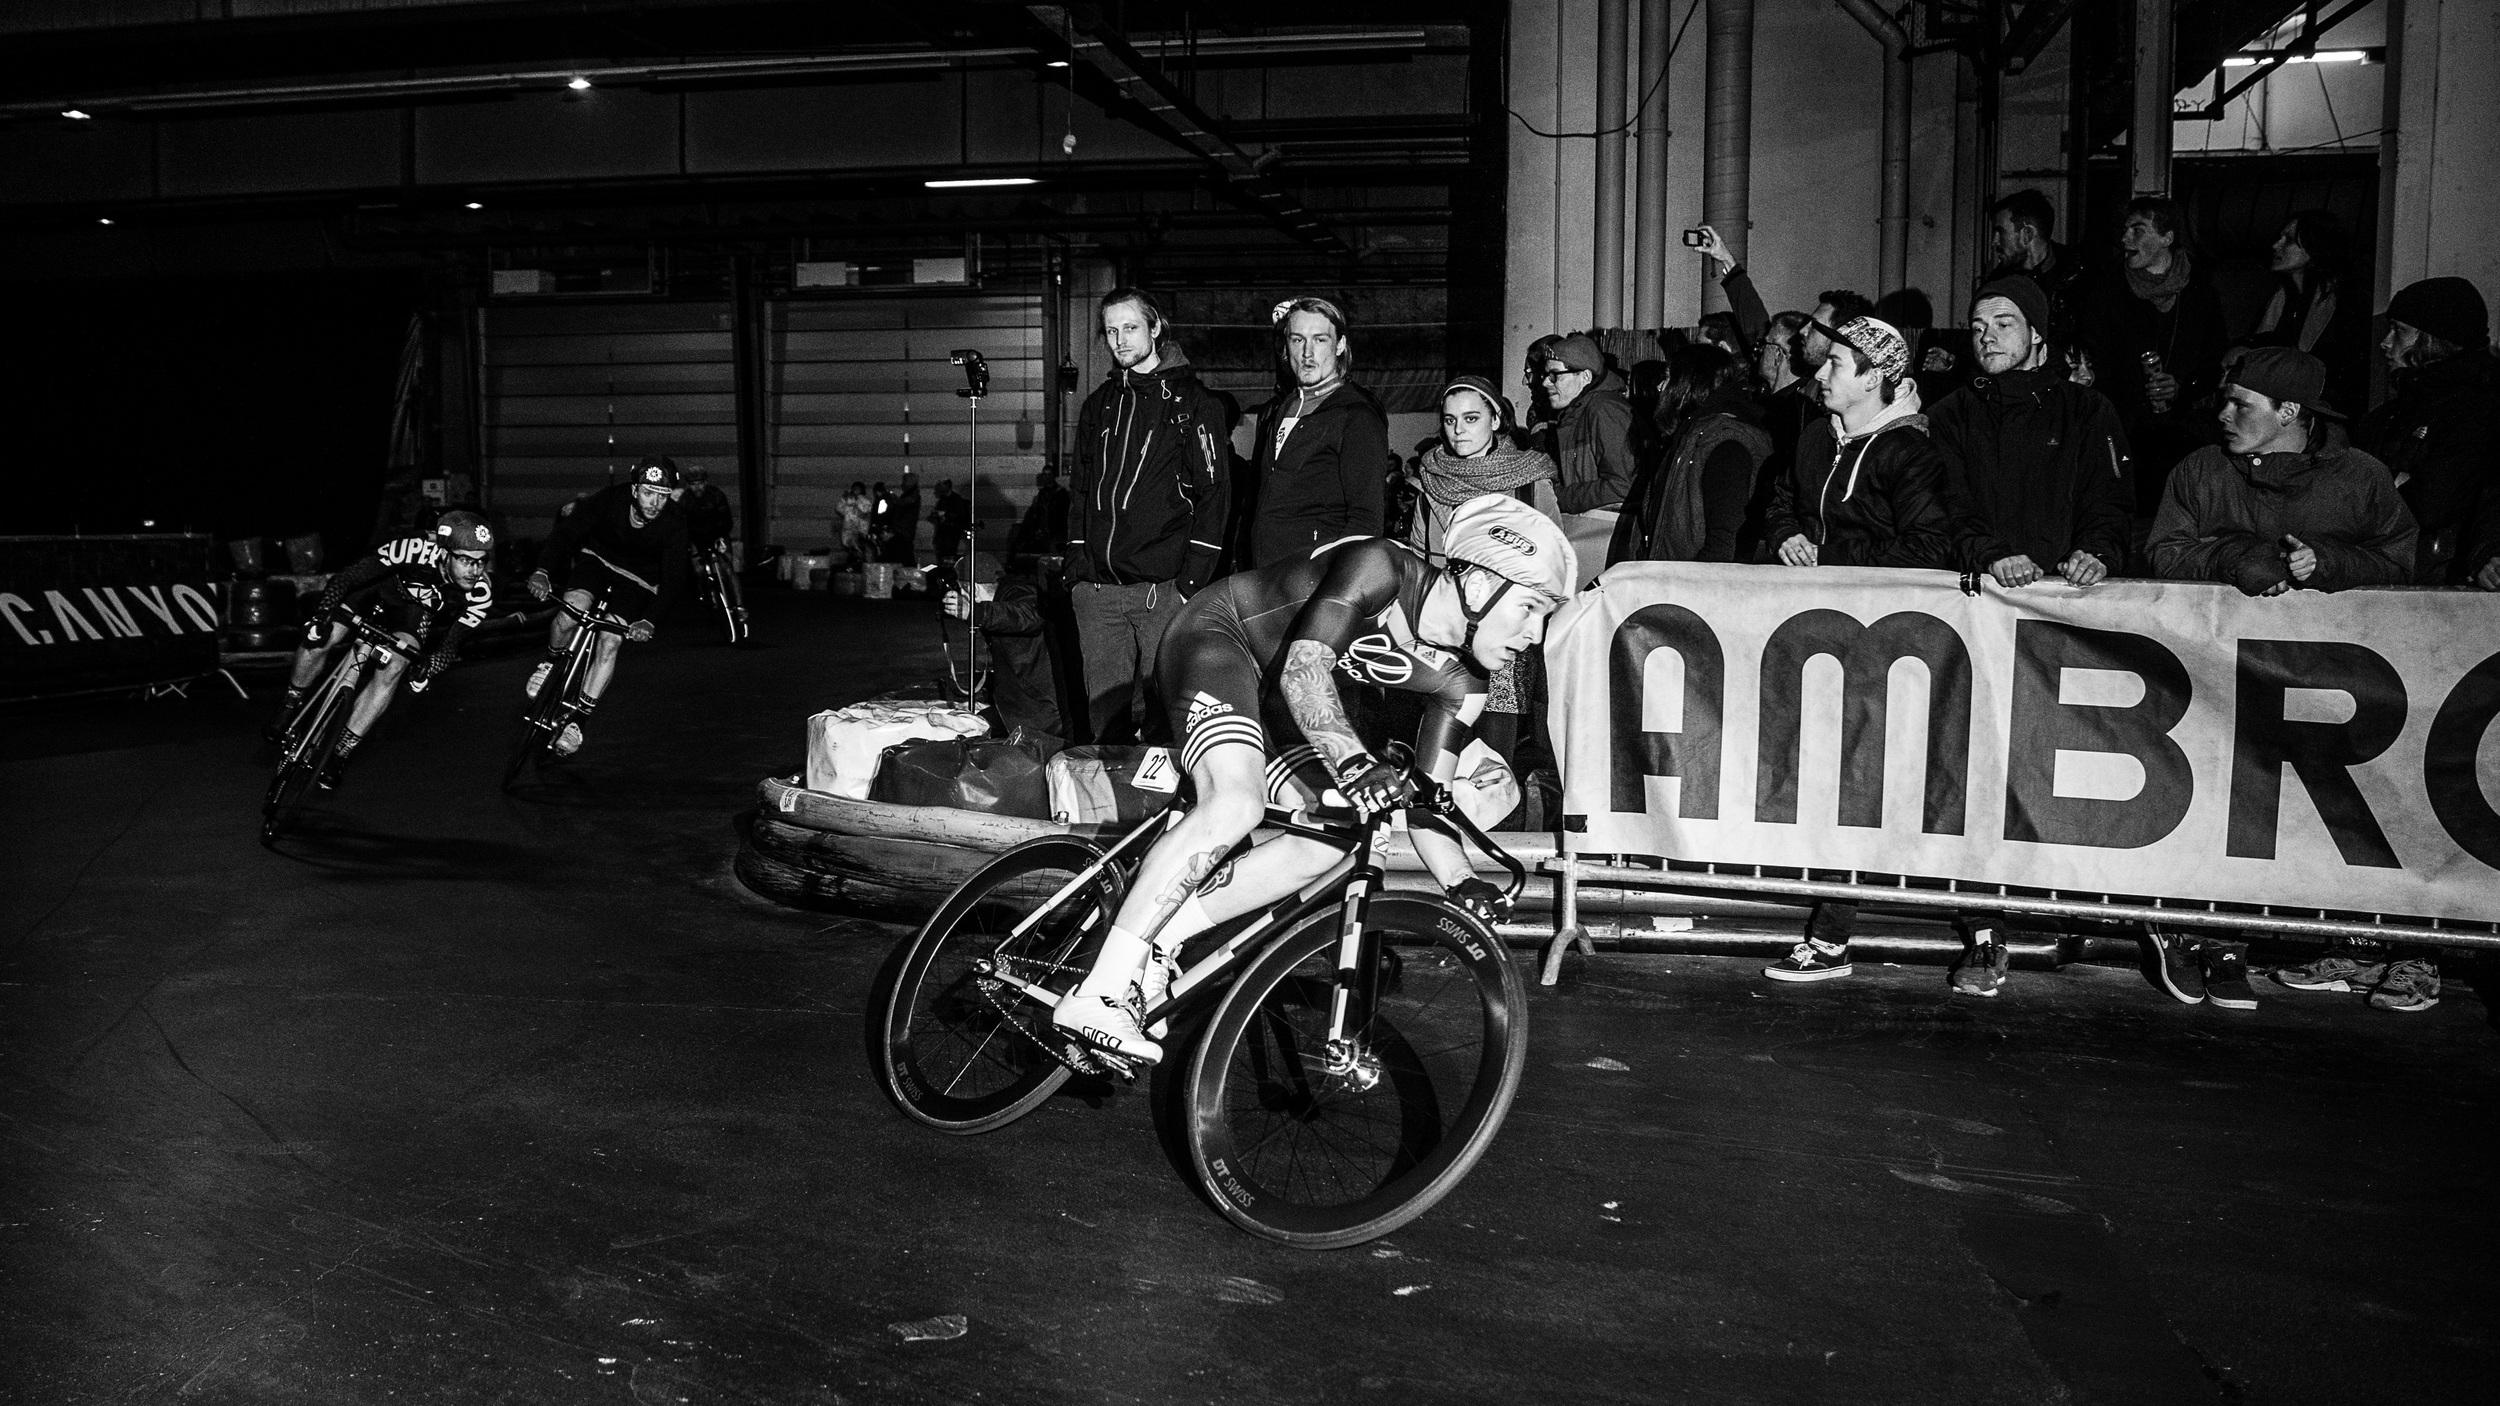 RAD RACE Last Man Standing, Berlin March 19 2016 - Shot by Drew Kaplan 46.jpg